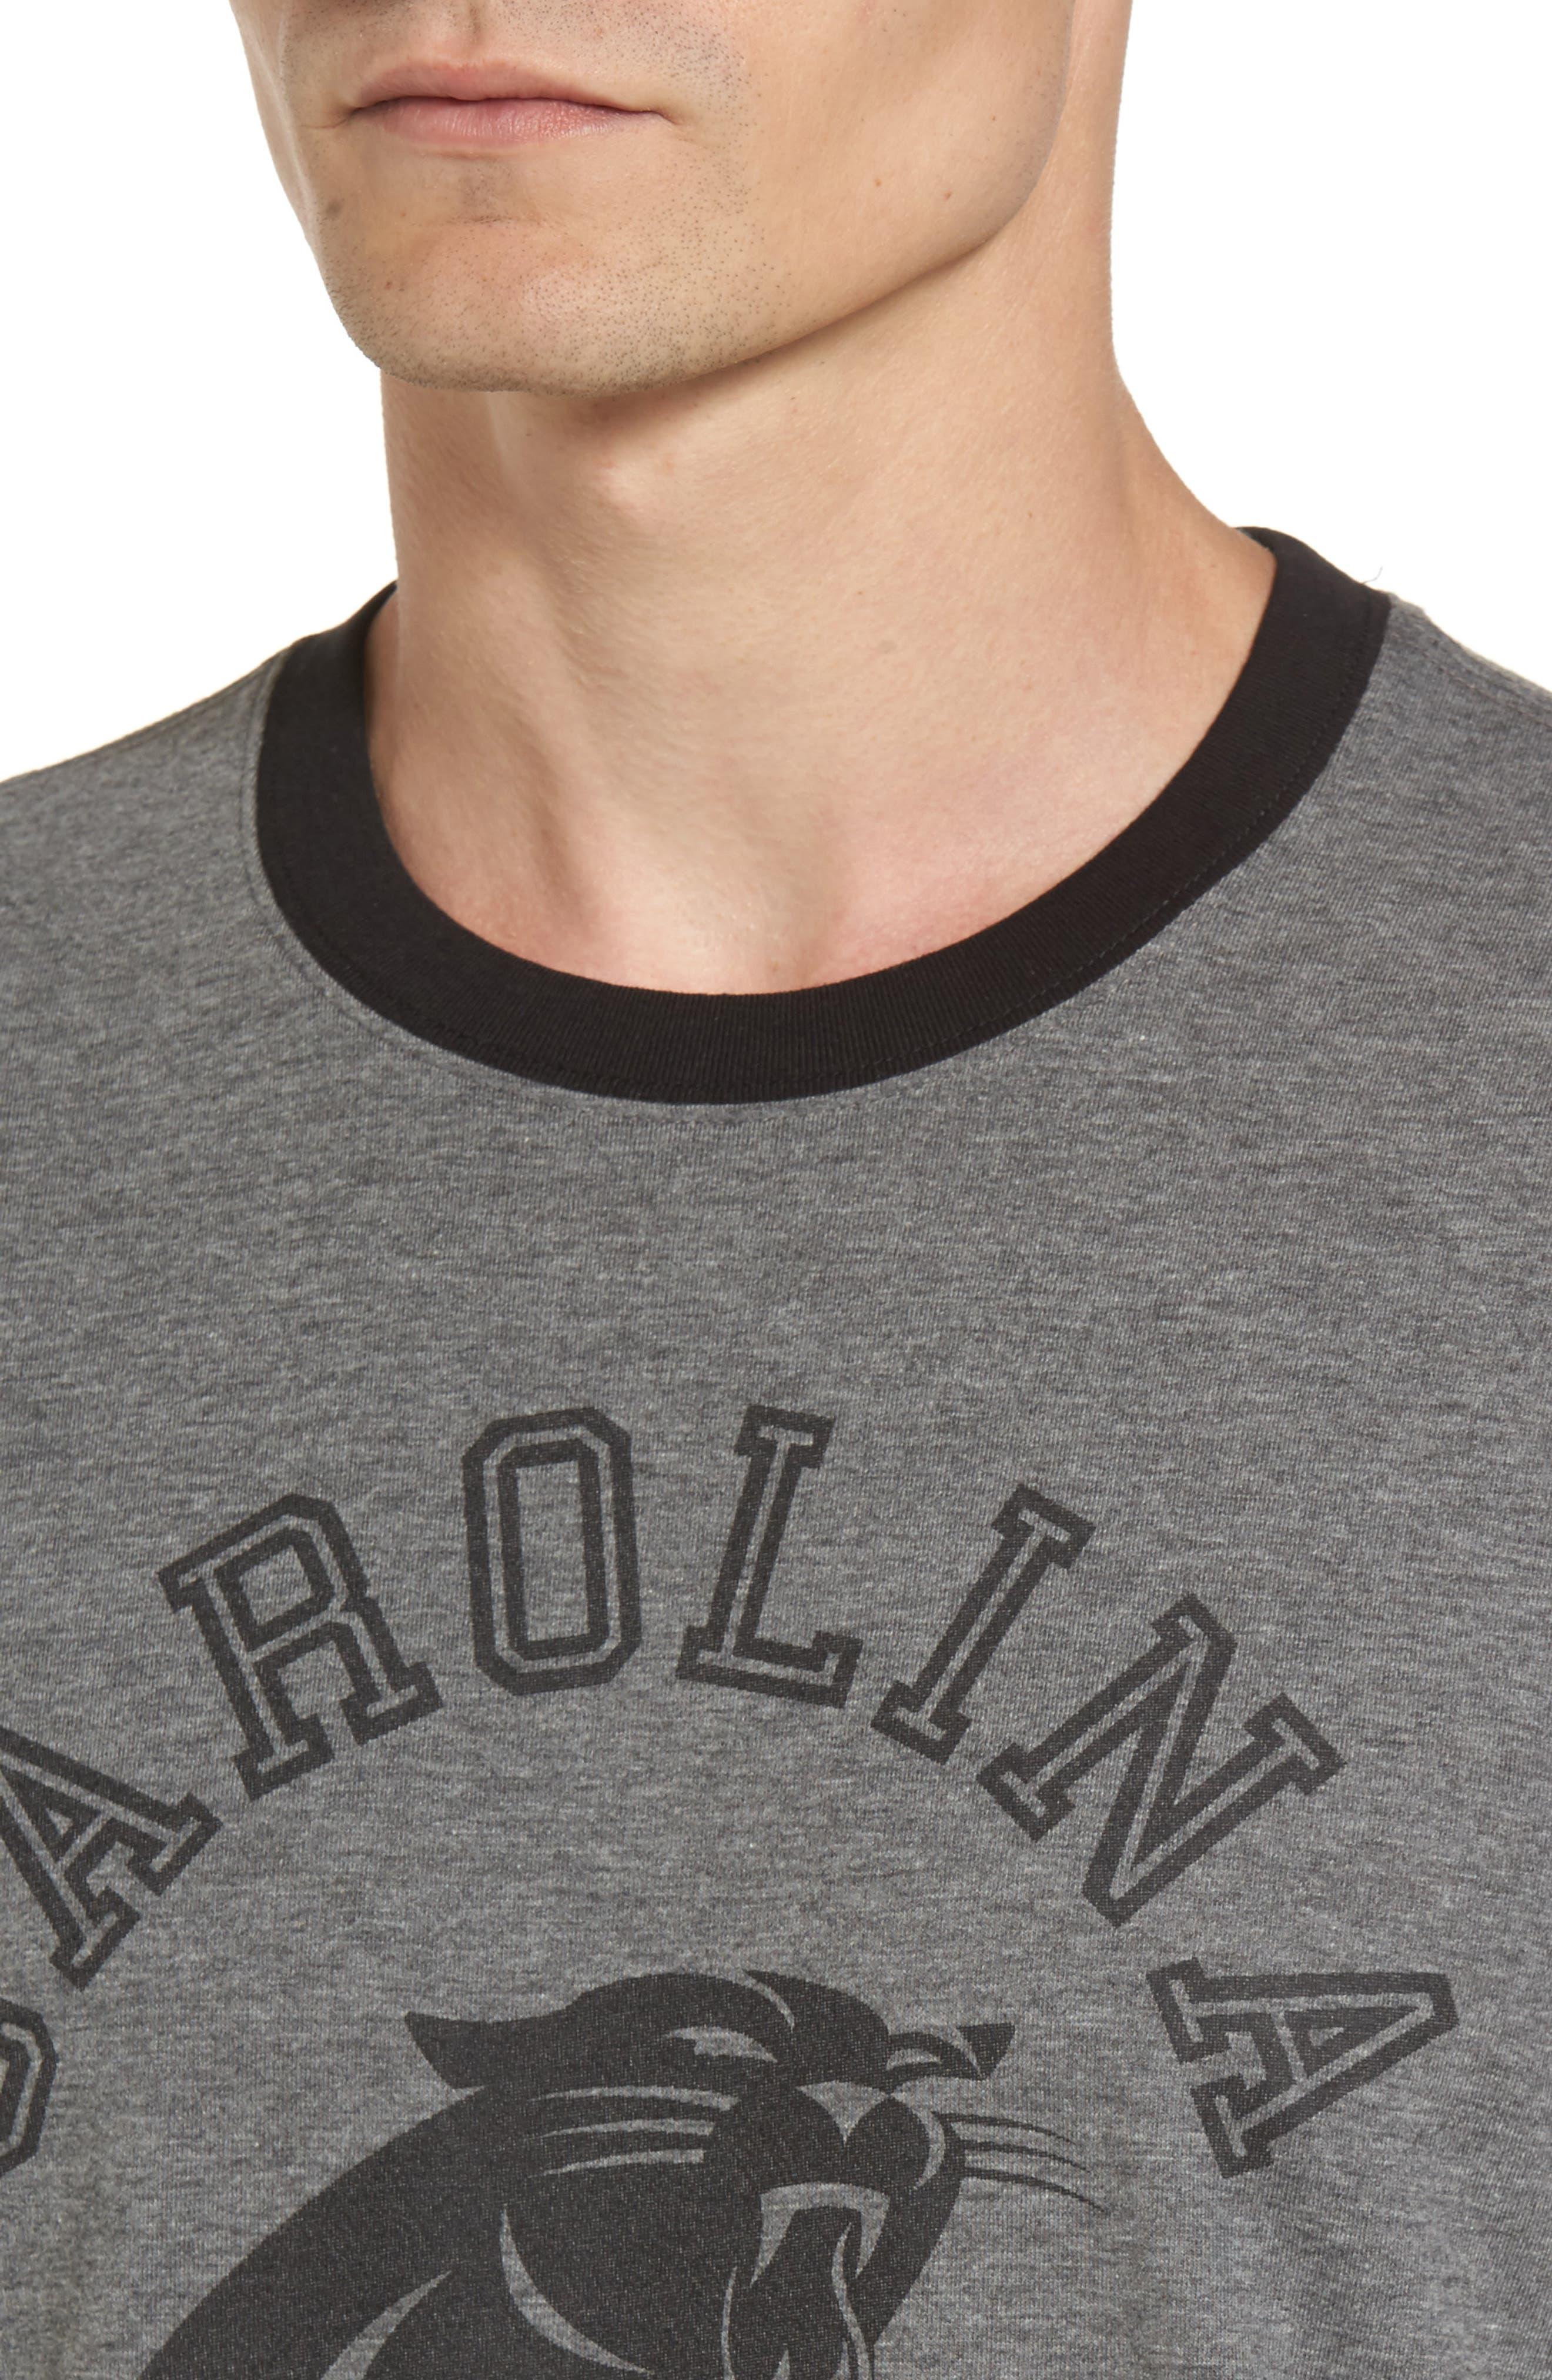 Carolina Panthers Ringer T-Shirt,                             Alternate thumbnail 4, color,                             021